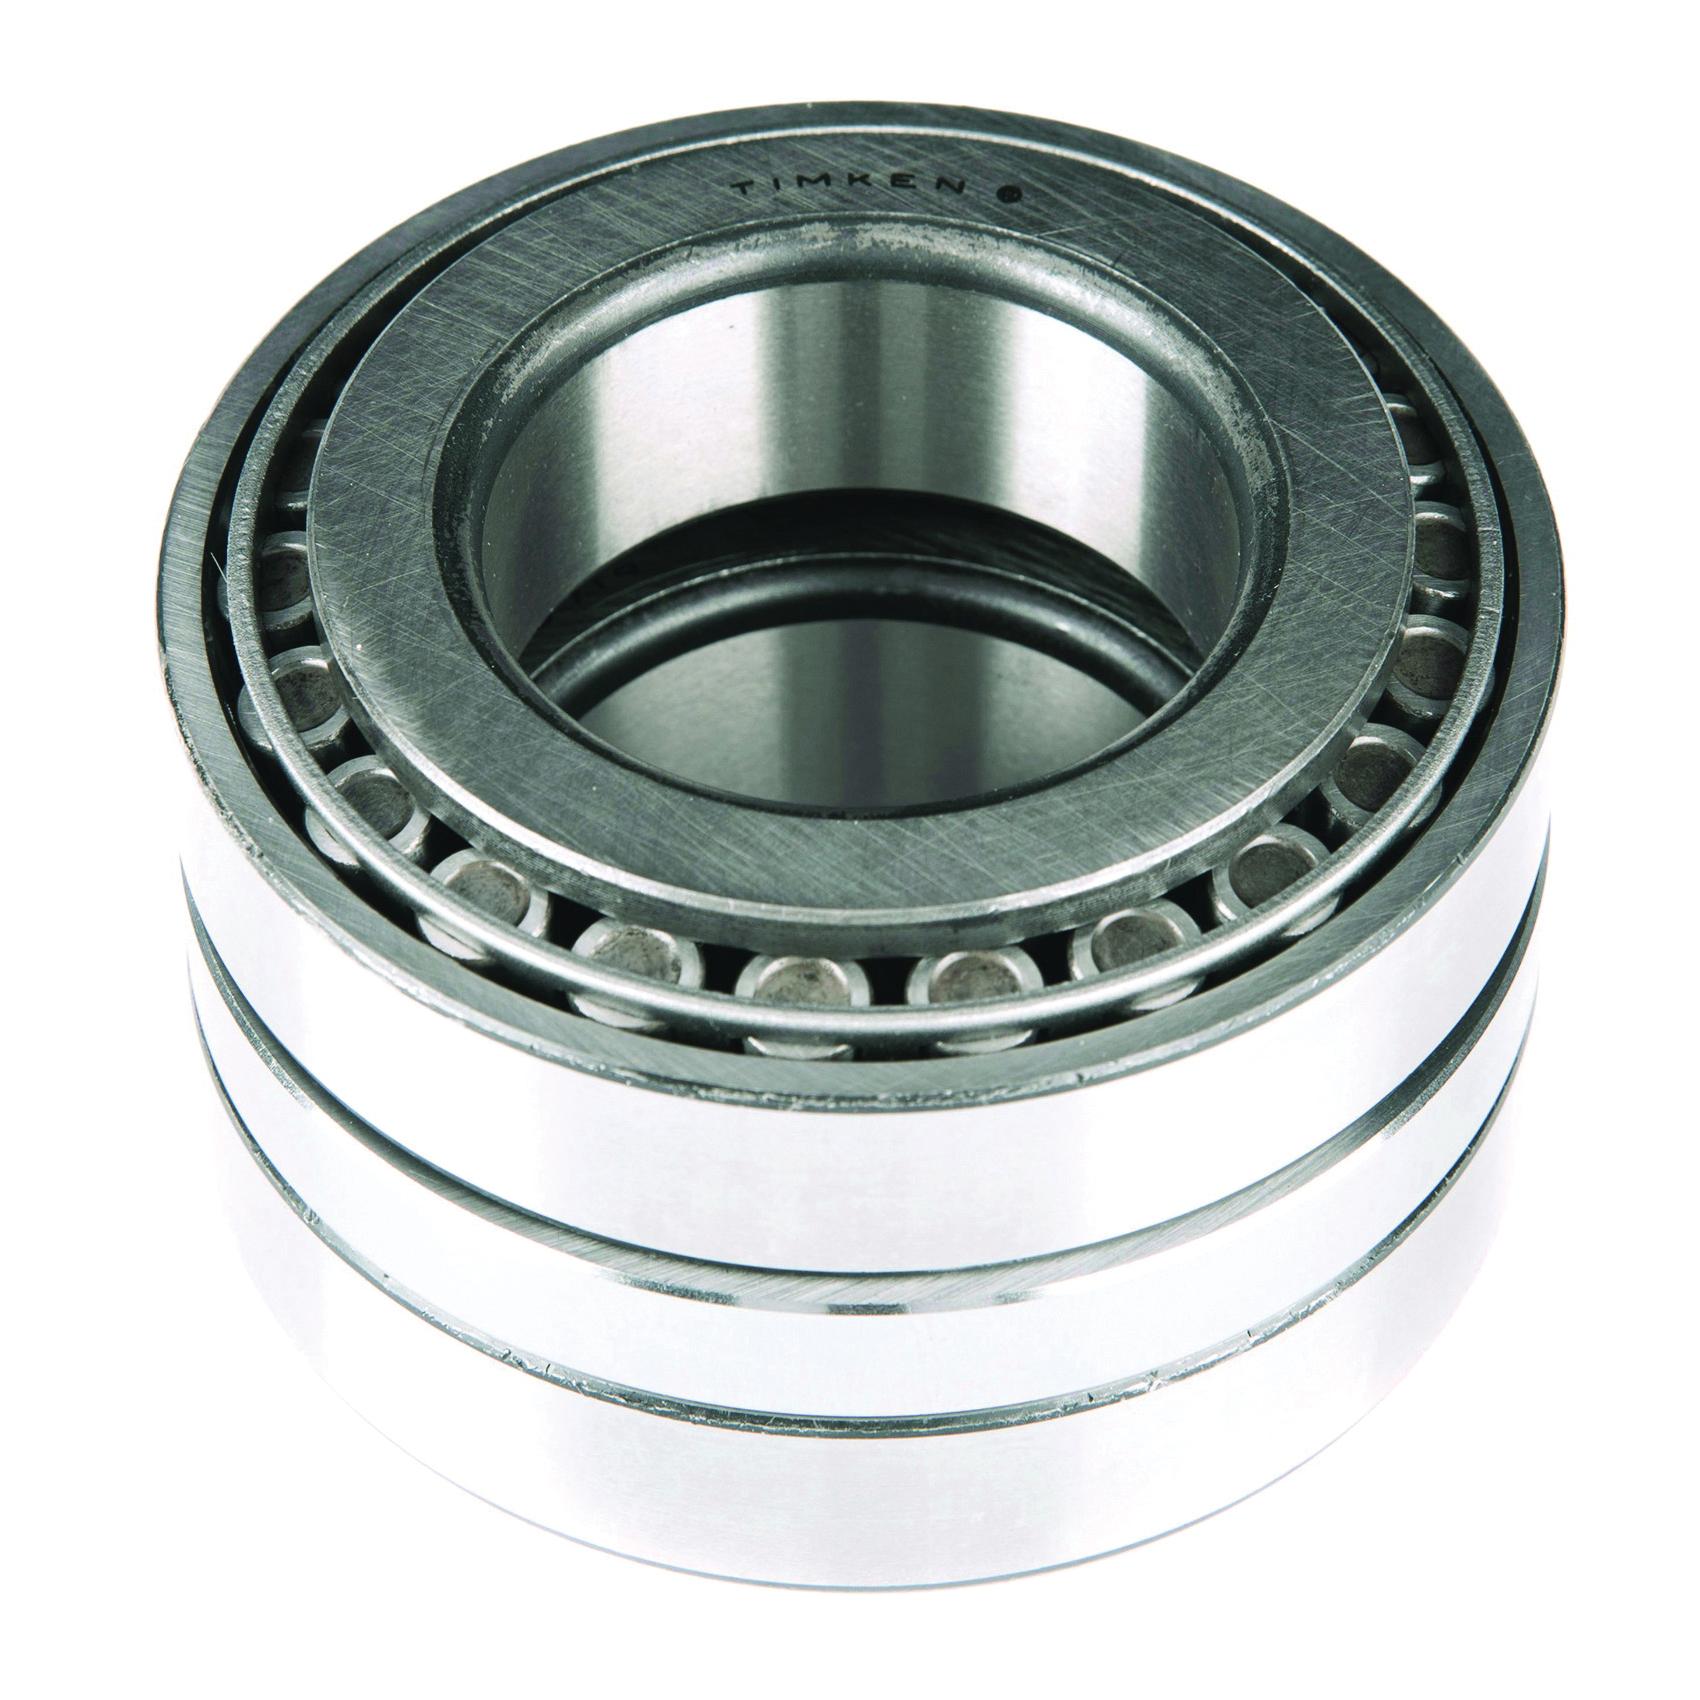 Timken® 28680-902A2